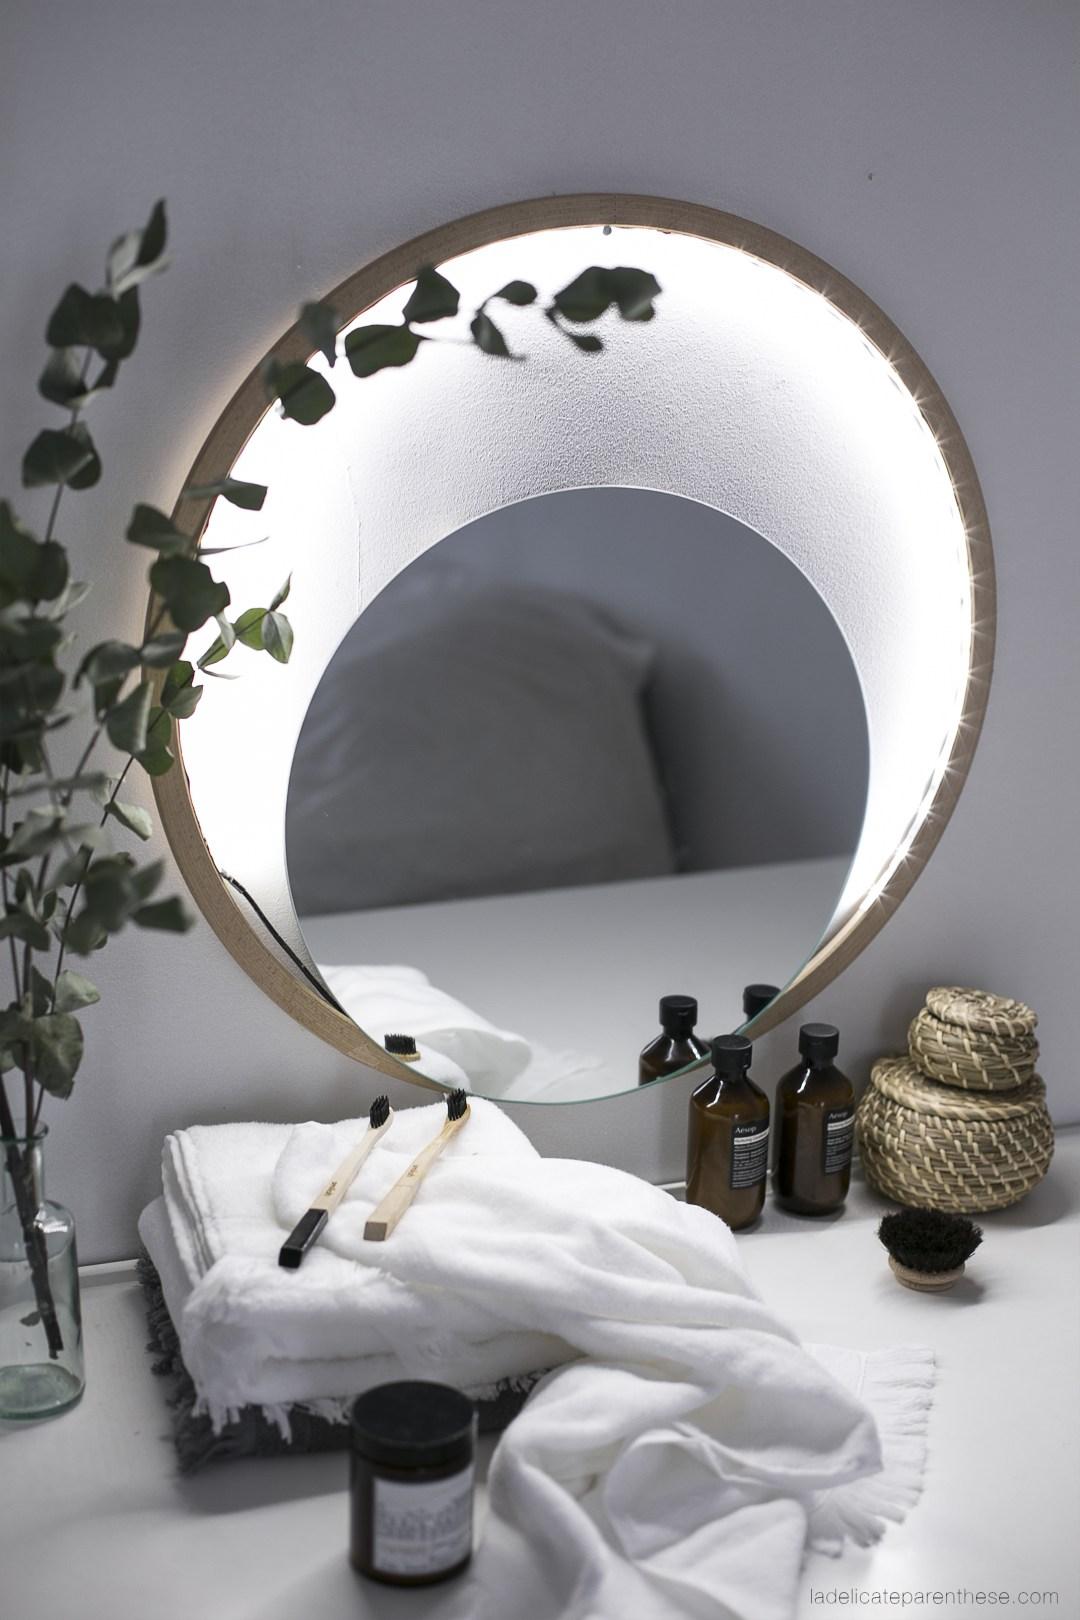 Miroir Eclairant Salle De Bain diy ] réaliser un miroir lumineux de salle de bain. - la